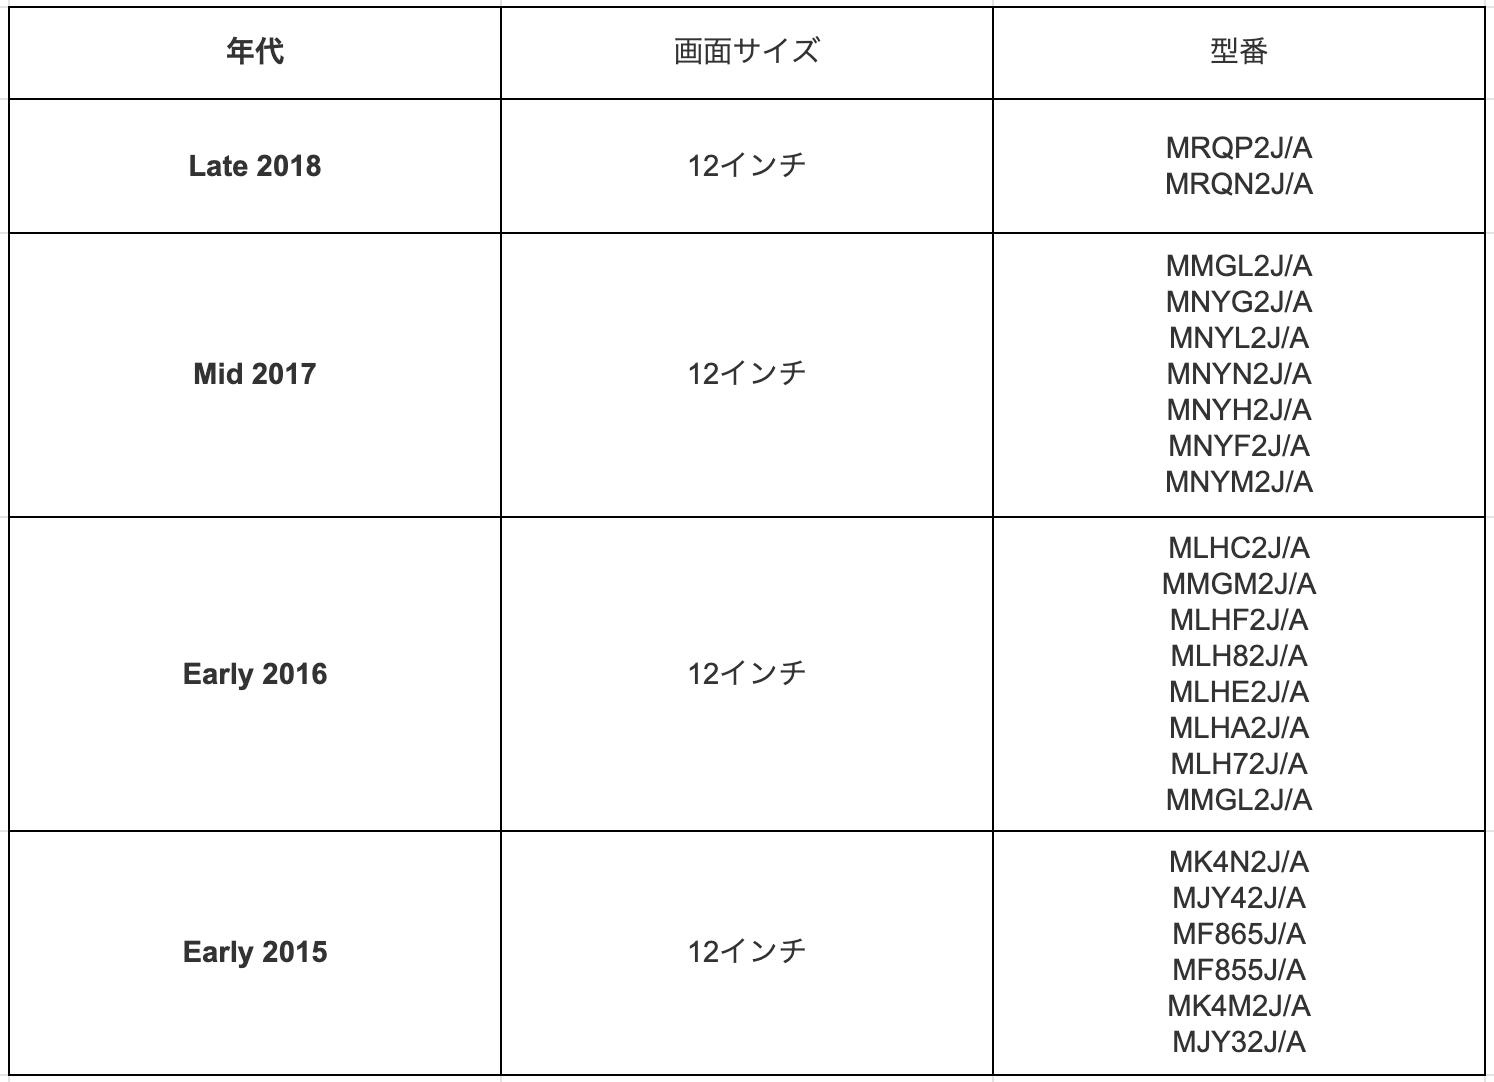 MacBook model number list